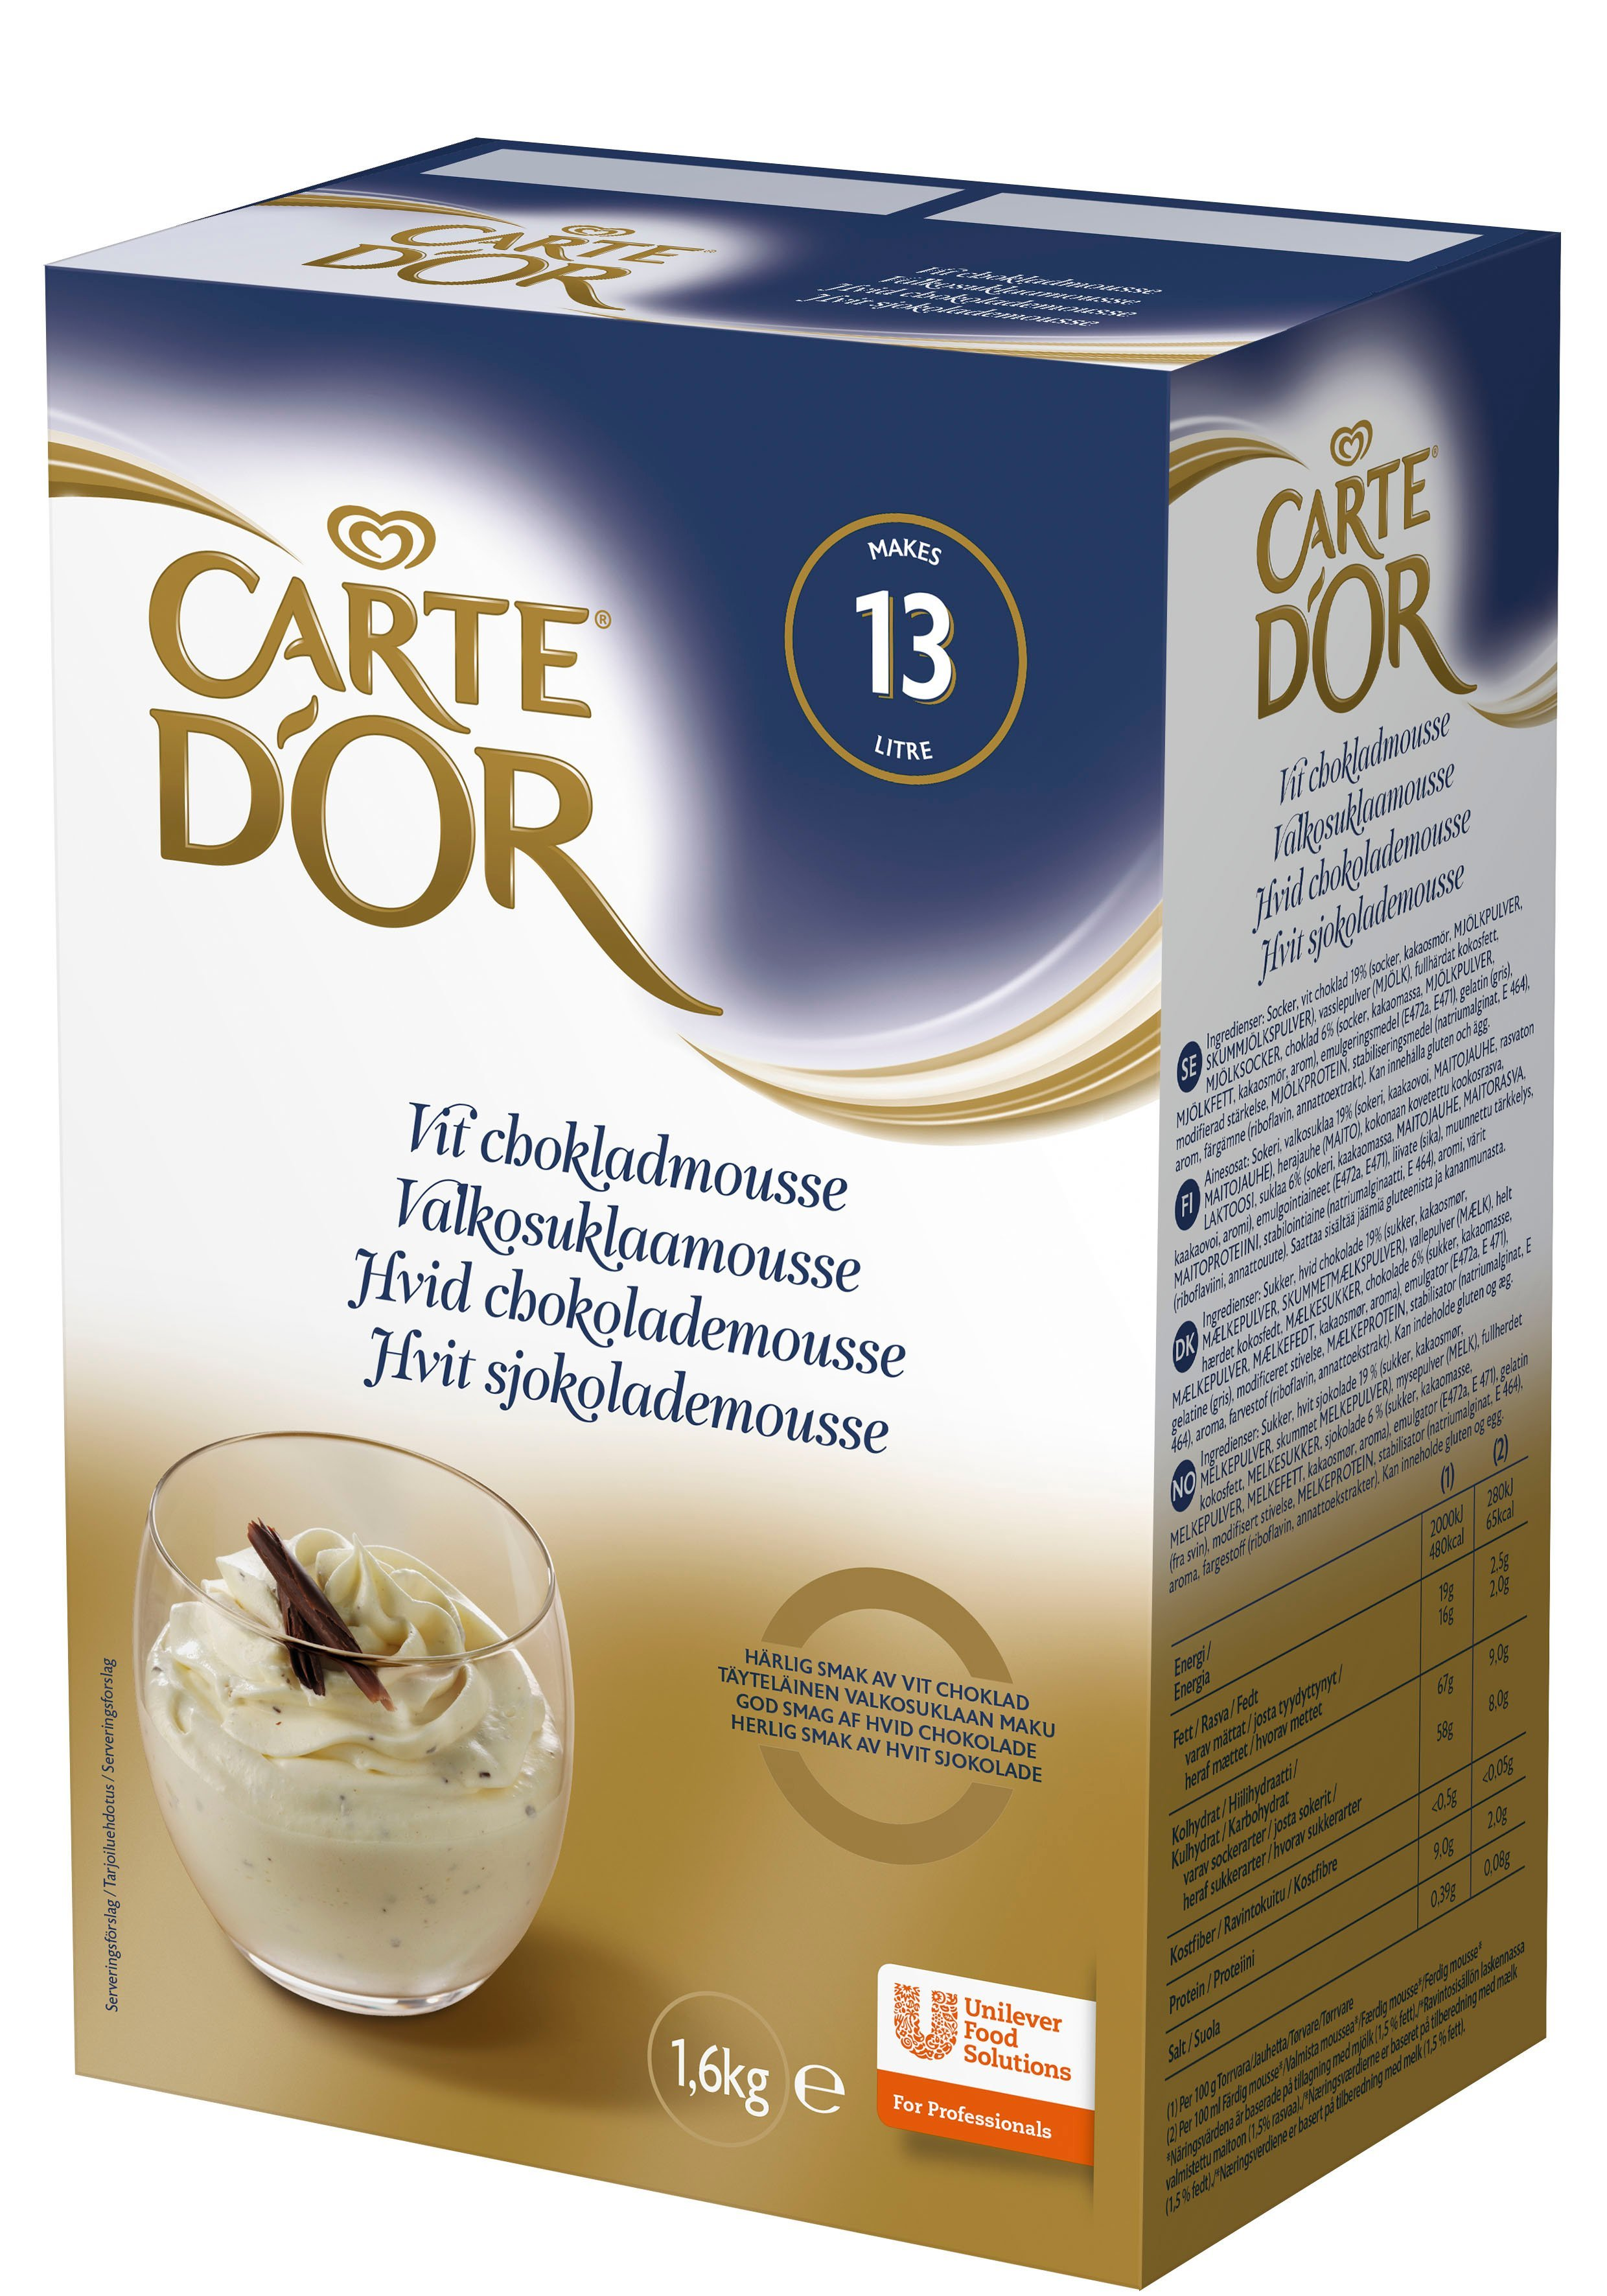 Carte d'Or Hvid chokolademousse